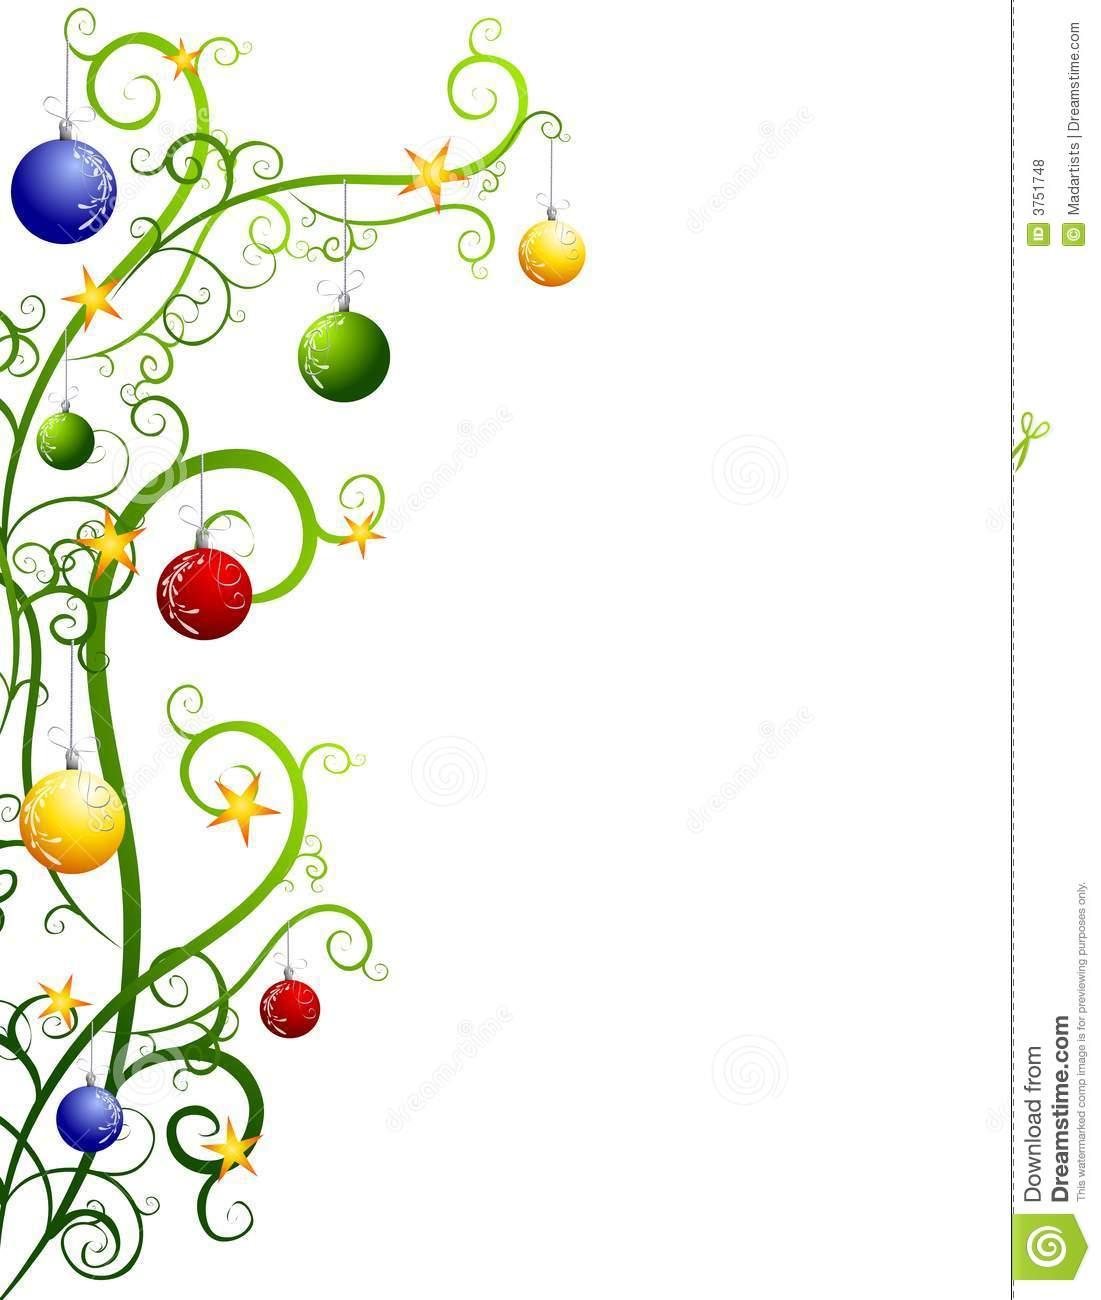 1101x1300 Free Christmas Clip Art Borders